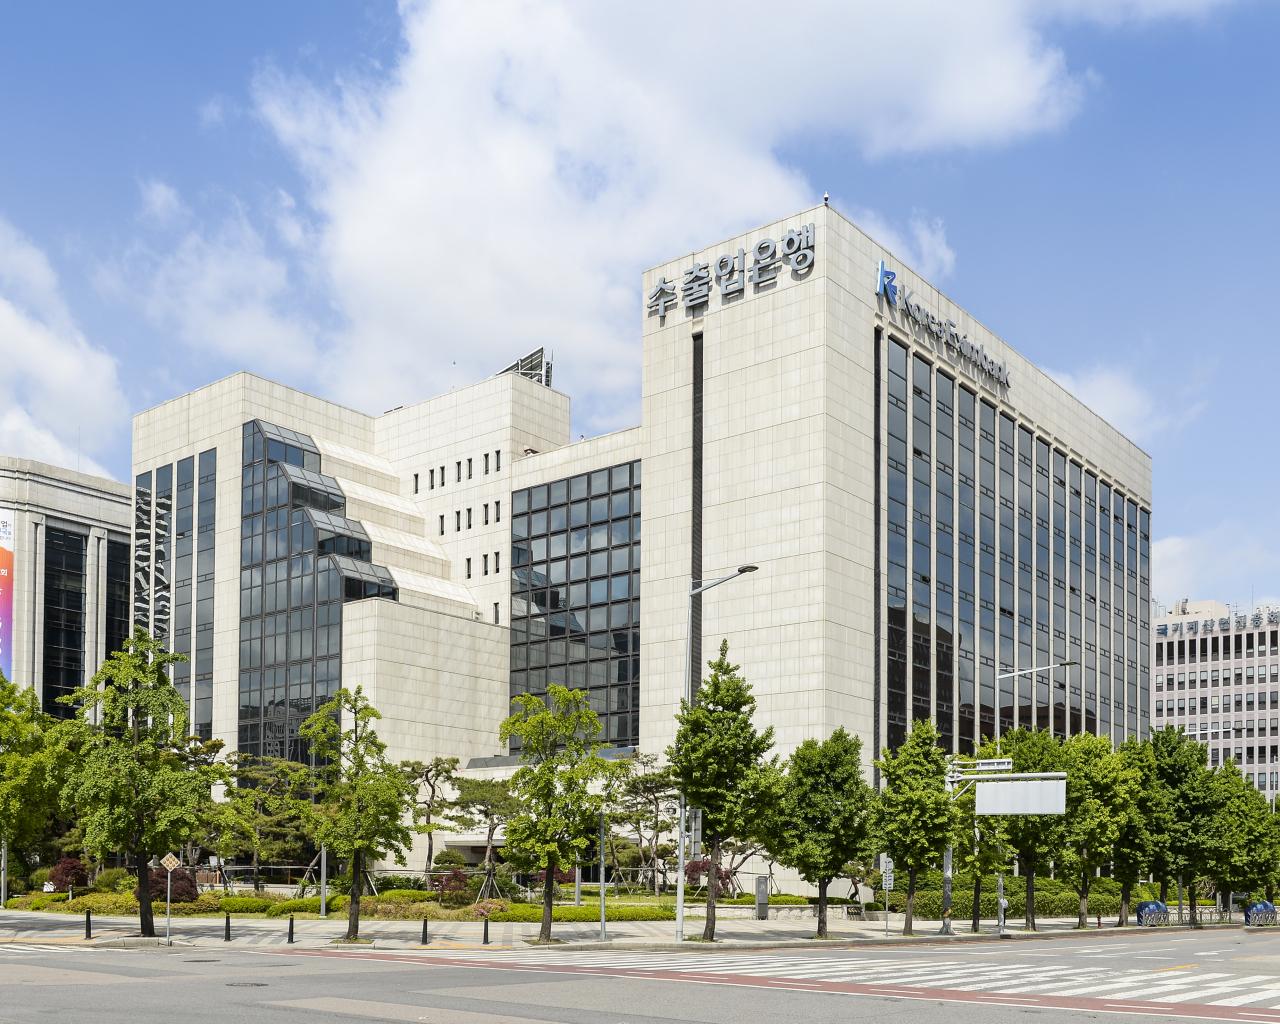 Export-Import Bank of Korea headquarters in Seoul (Eximbank)